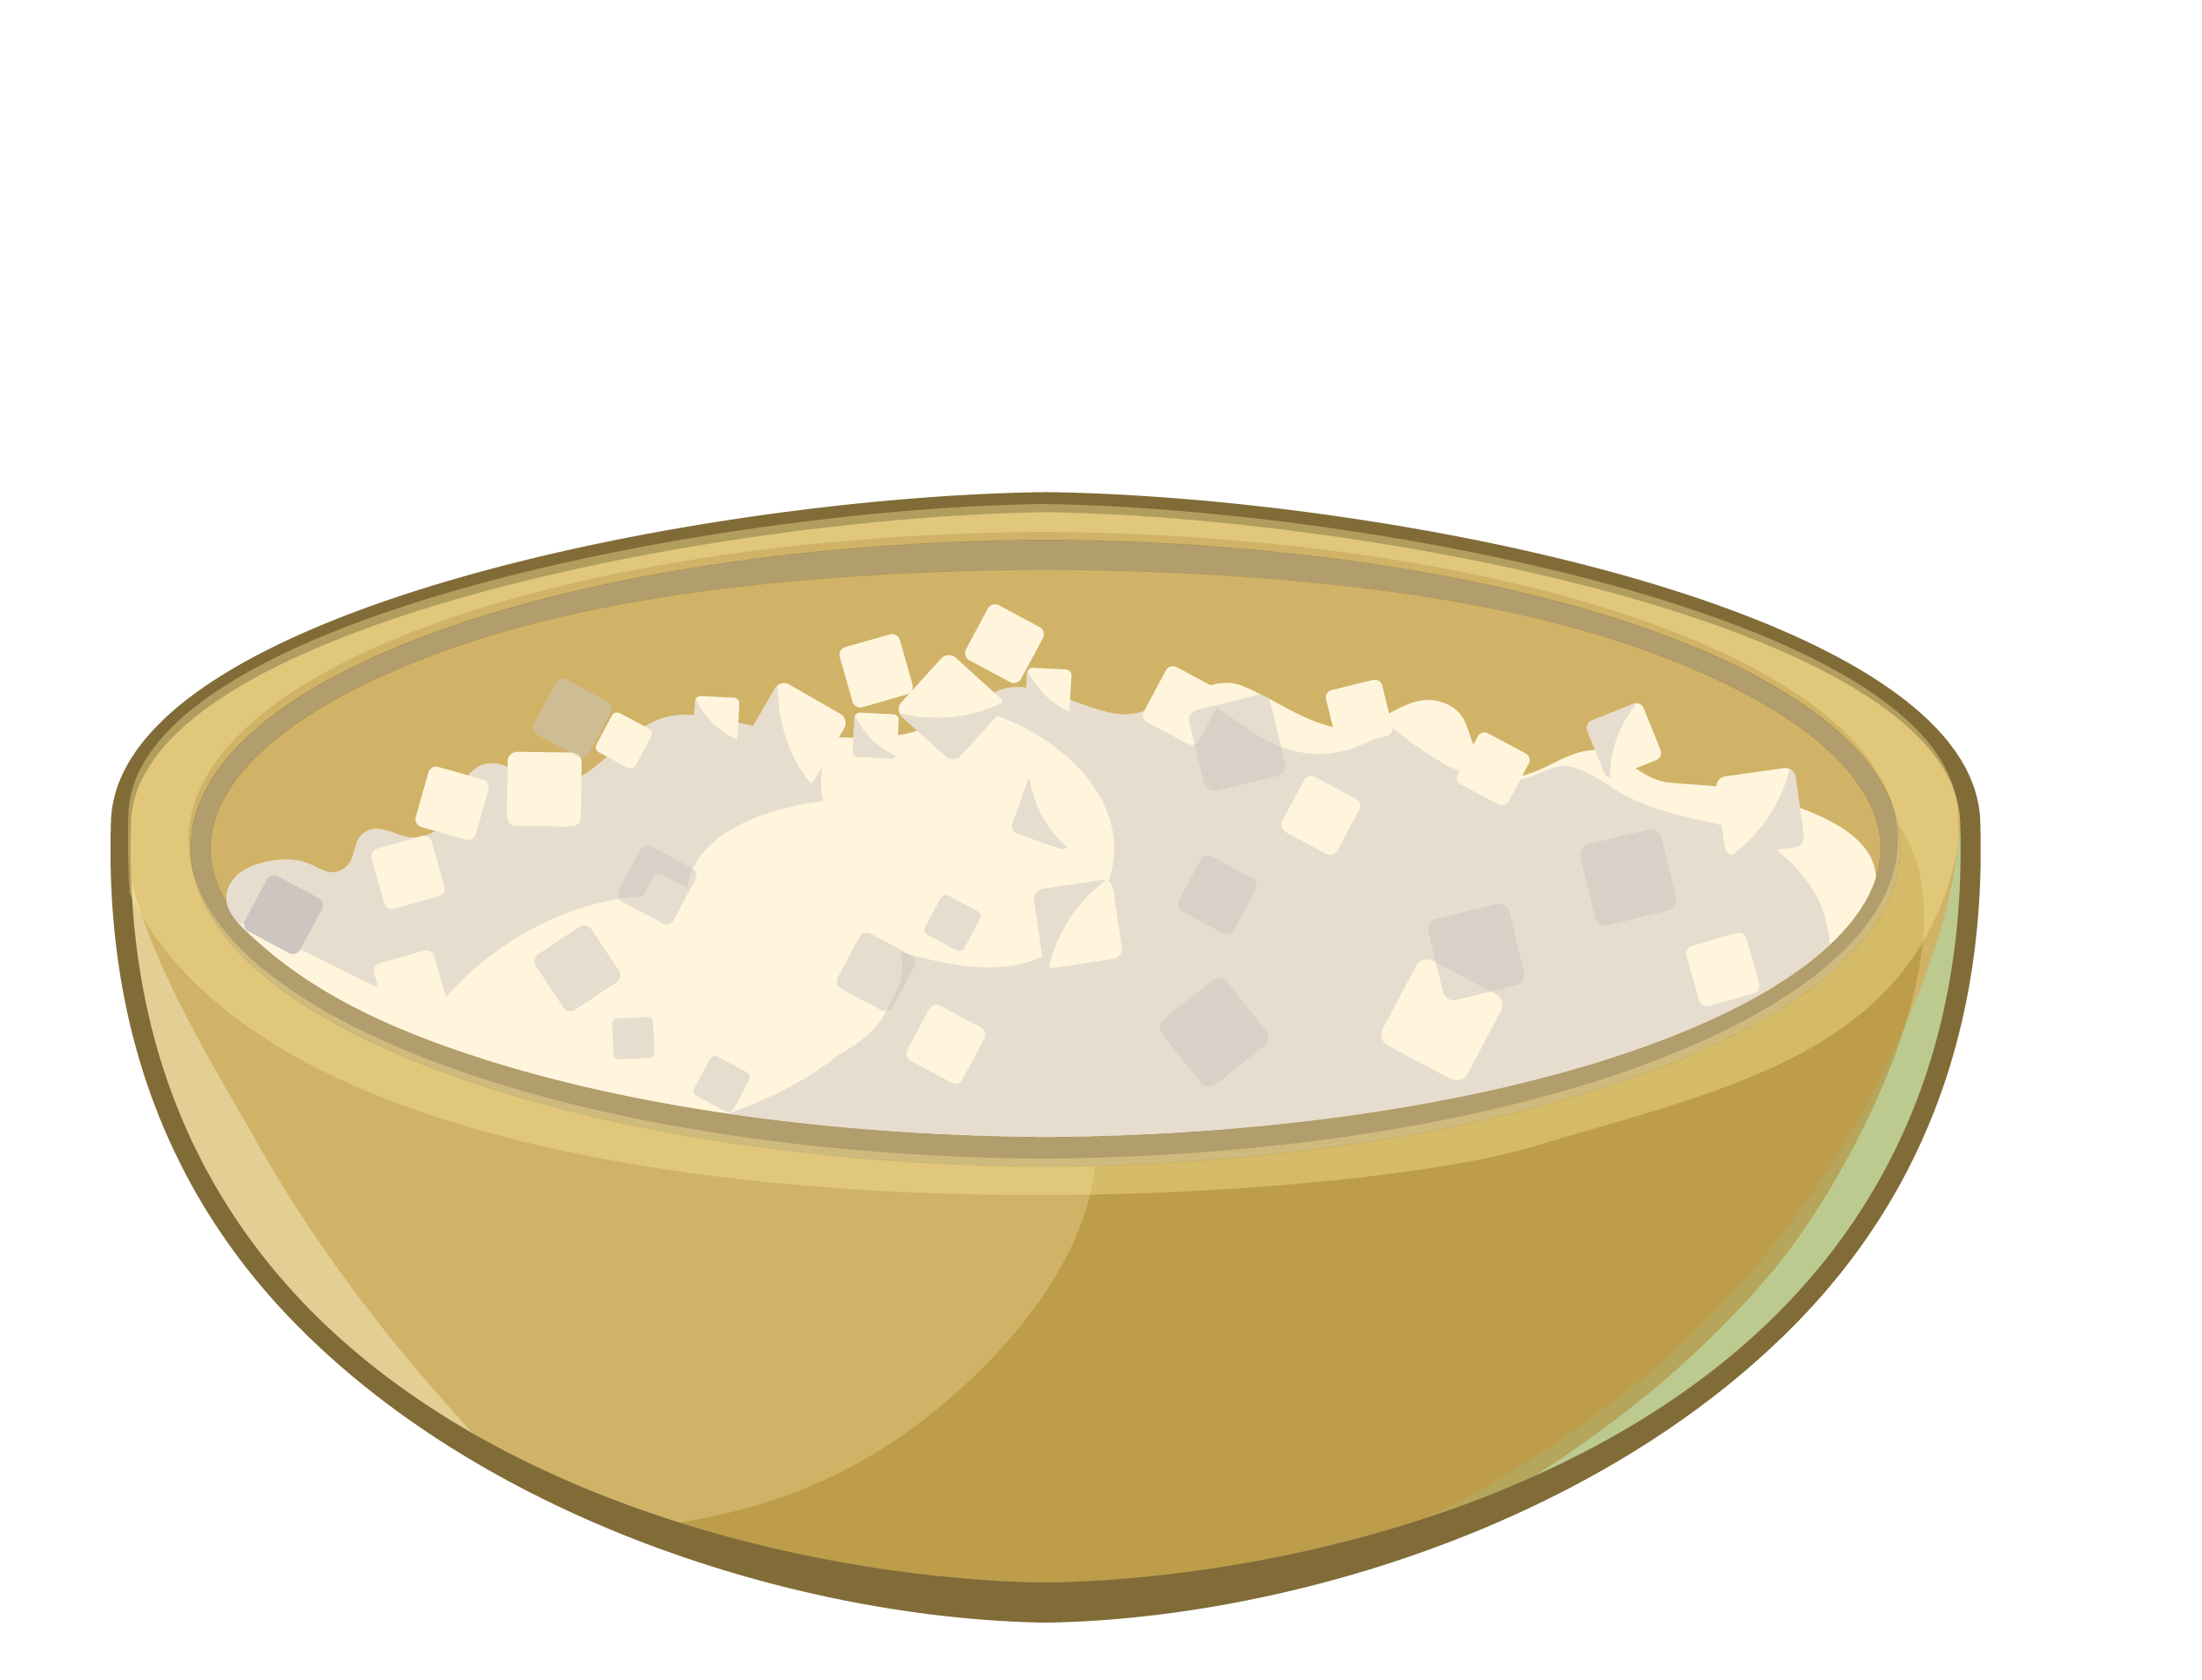 2529x1930 Rice Bowl Clip Art